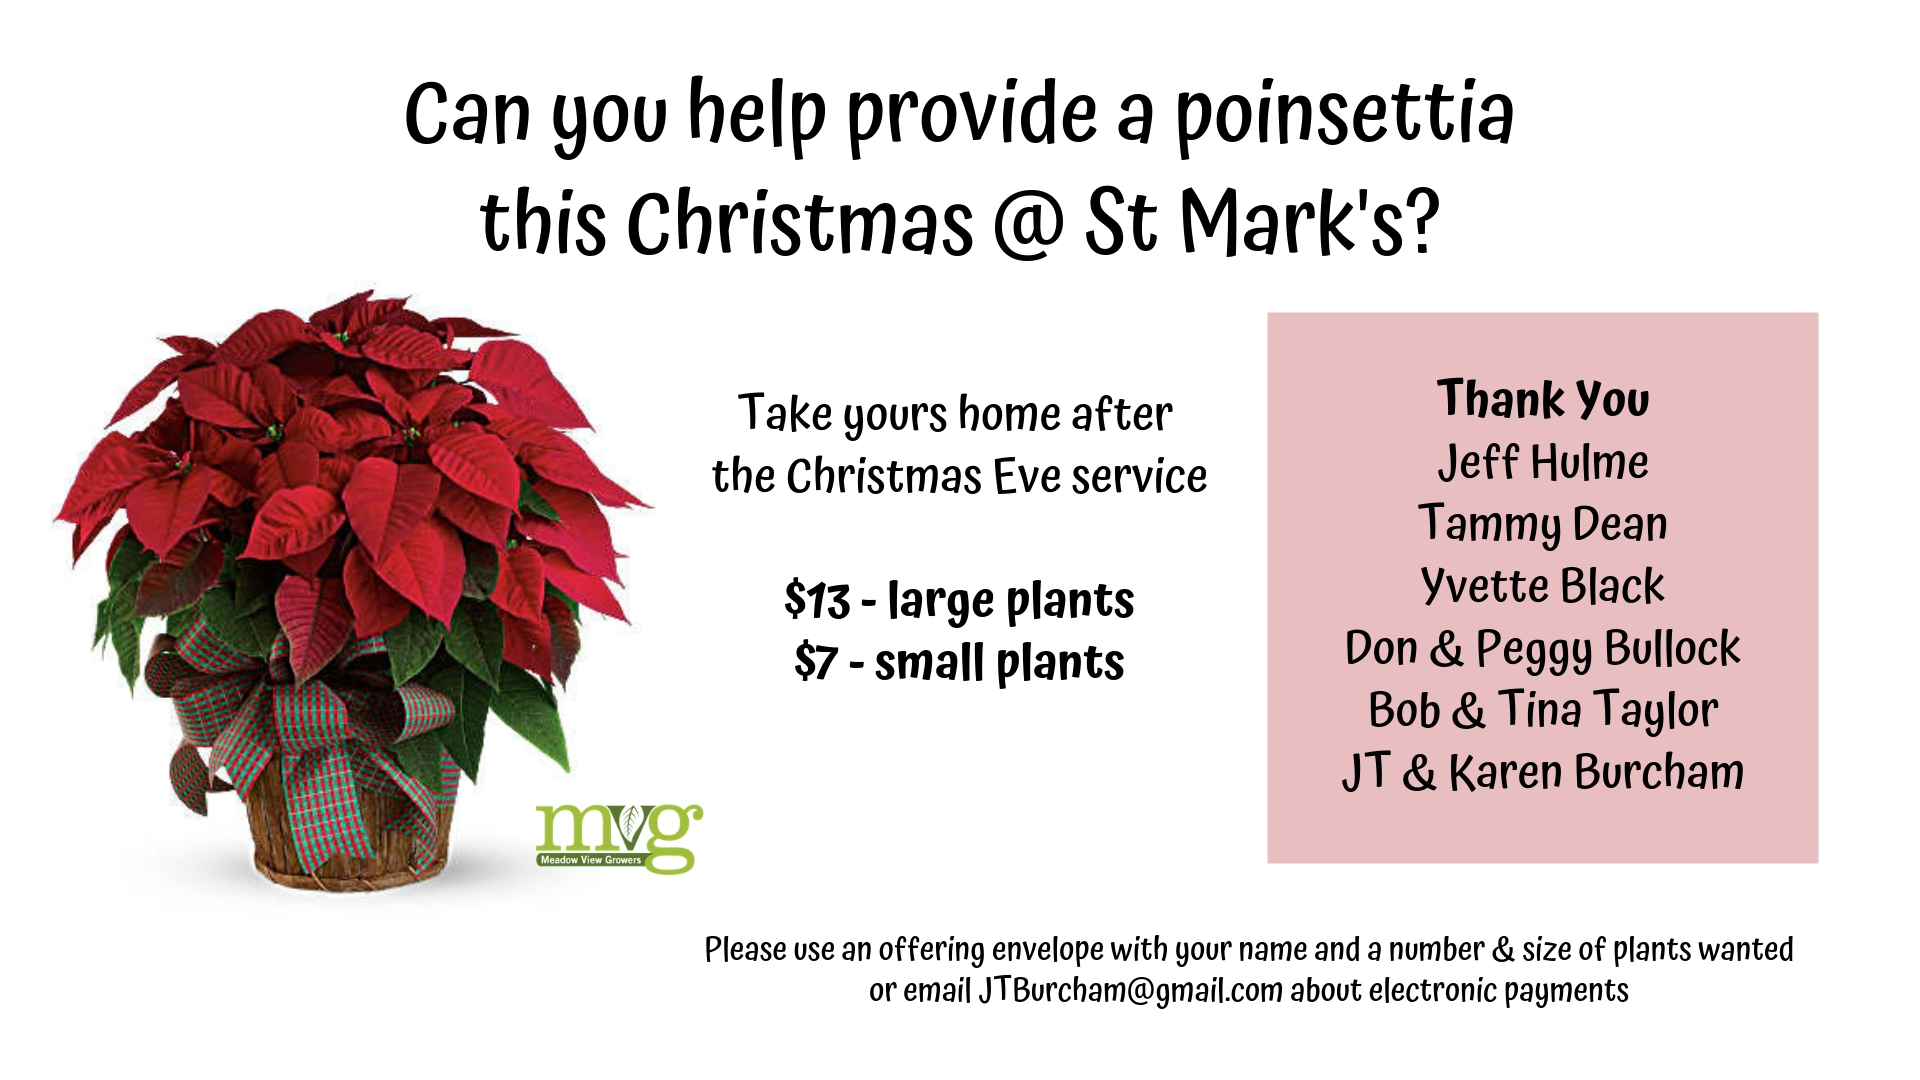 181216-Poinsettias @ St Mark's this Christmas .jpg